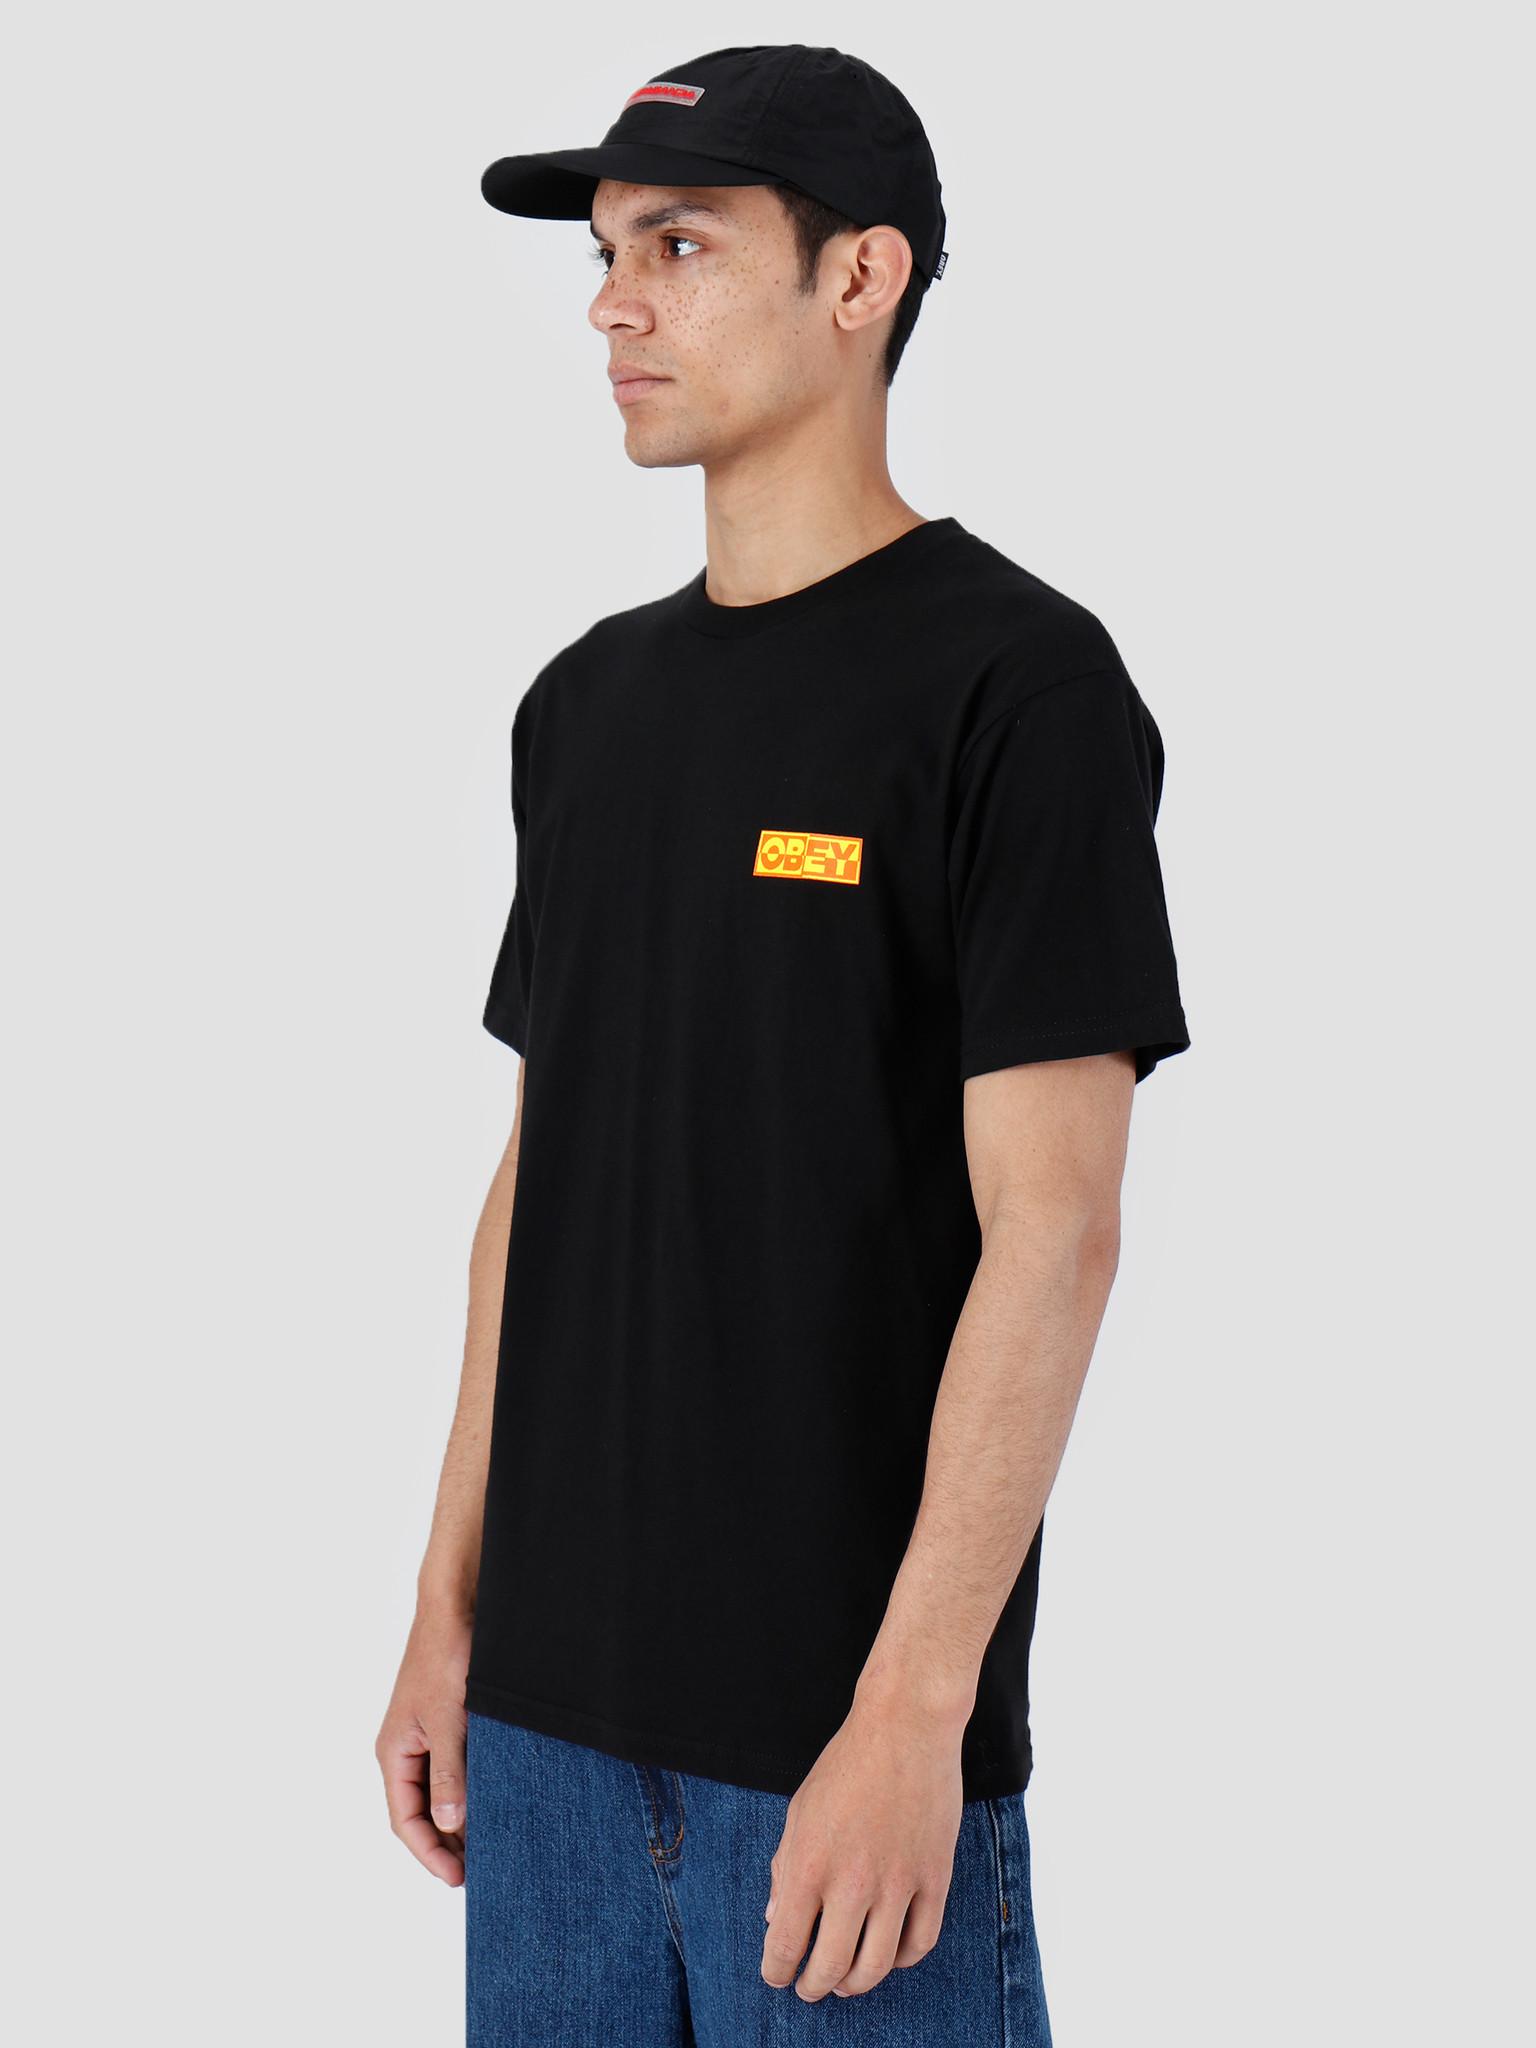 Obey Obey Basic T-Shirt Black 163081966-BLK